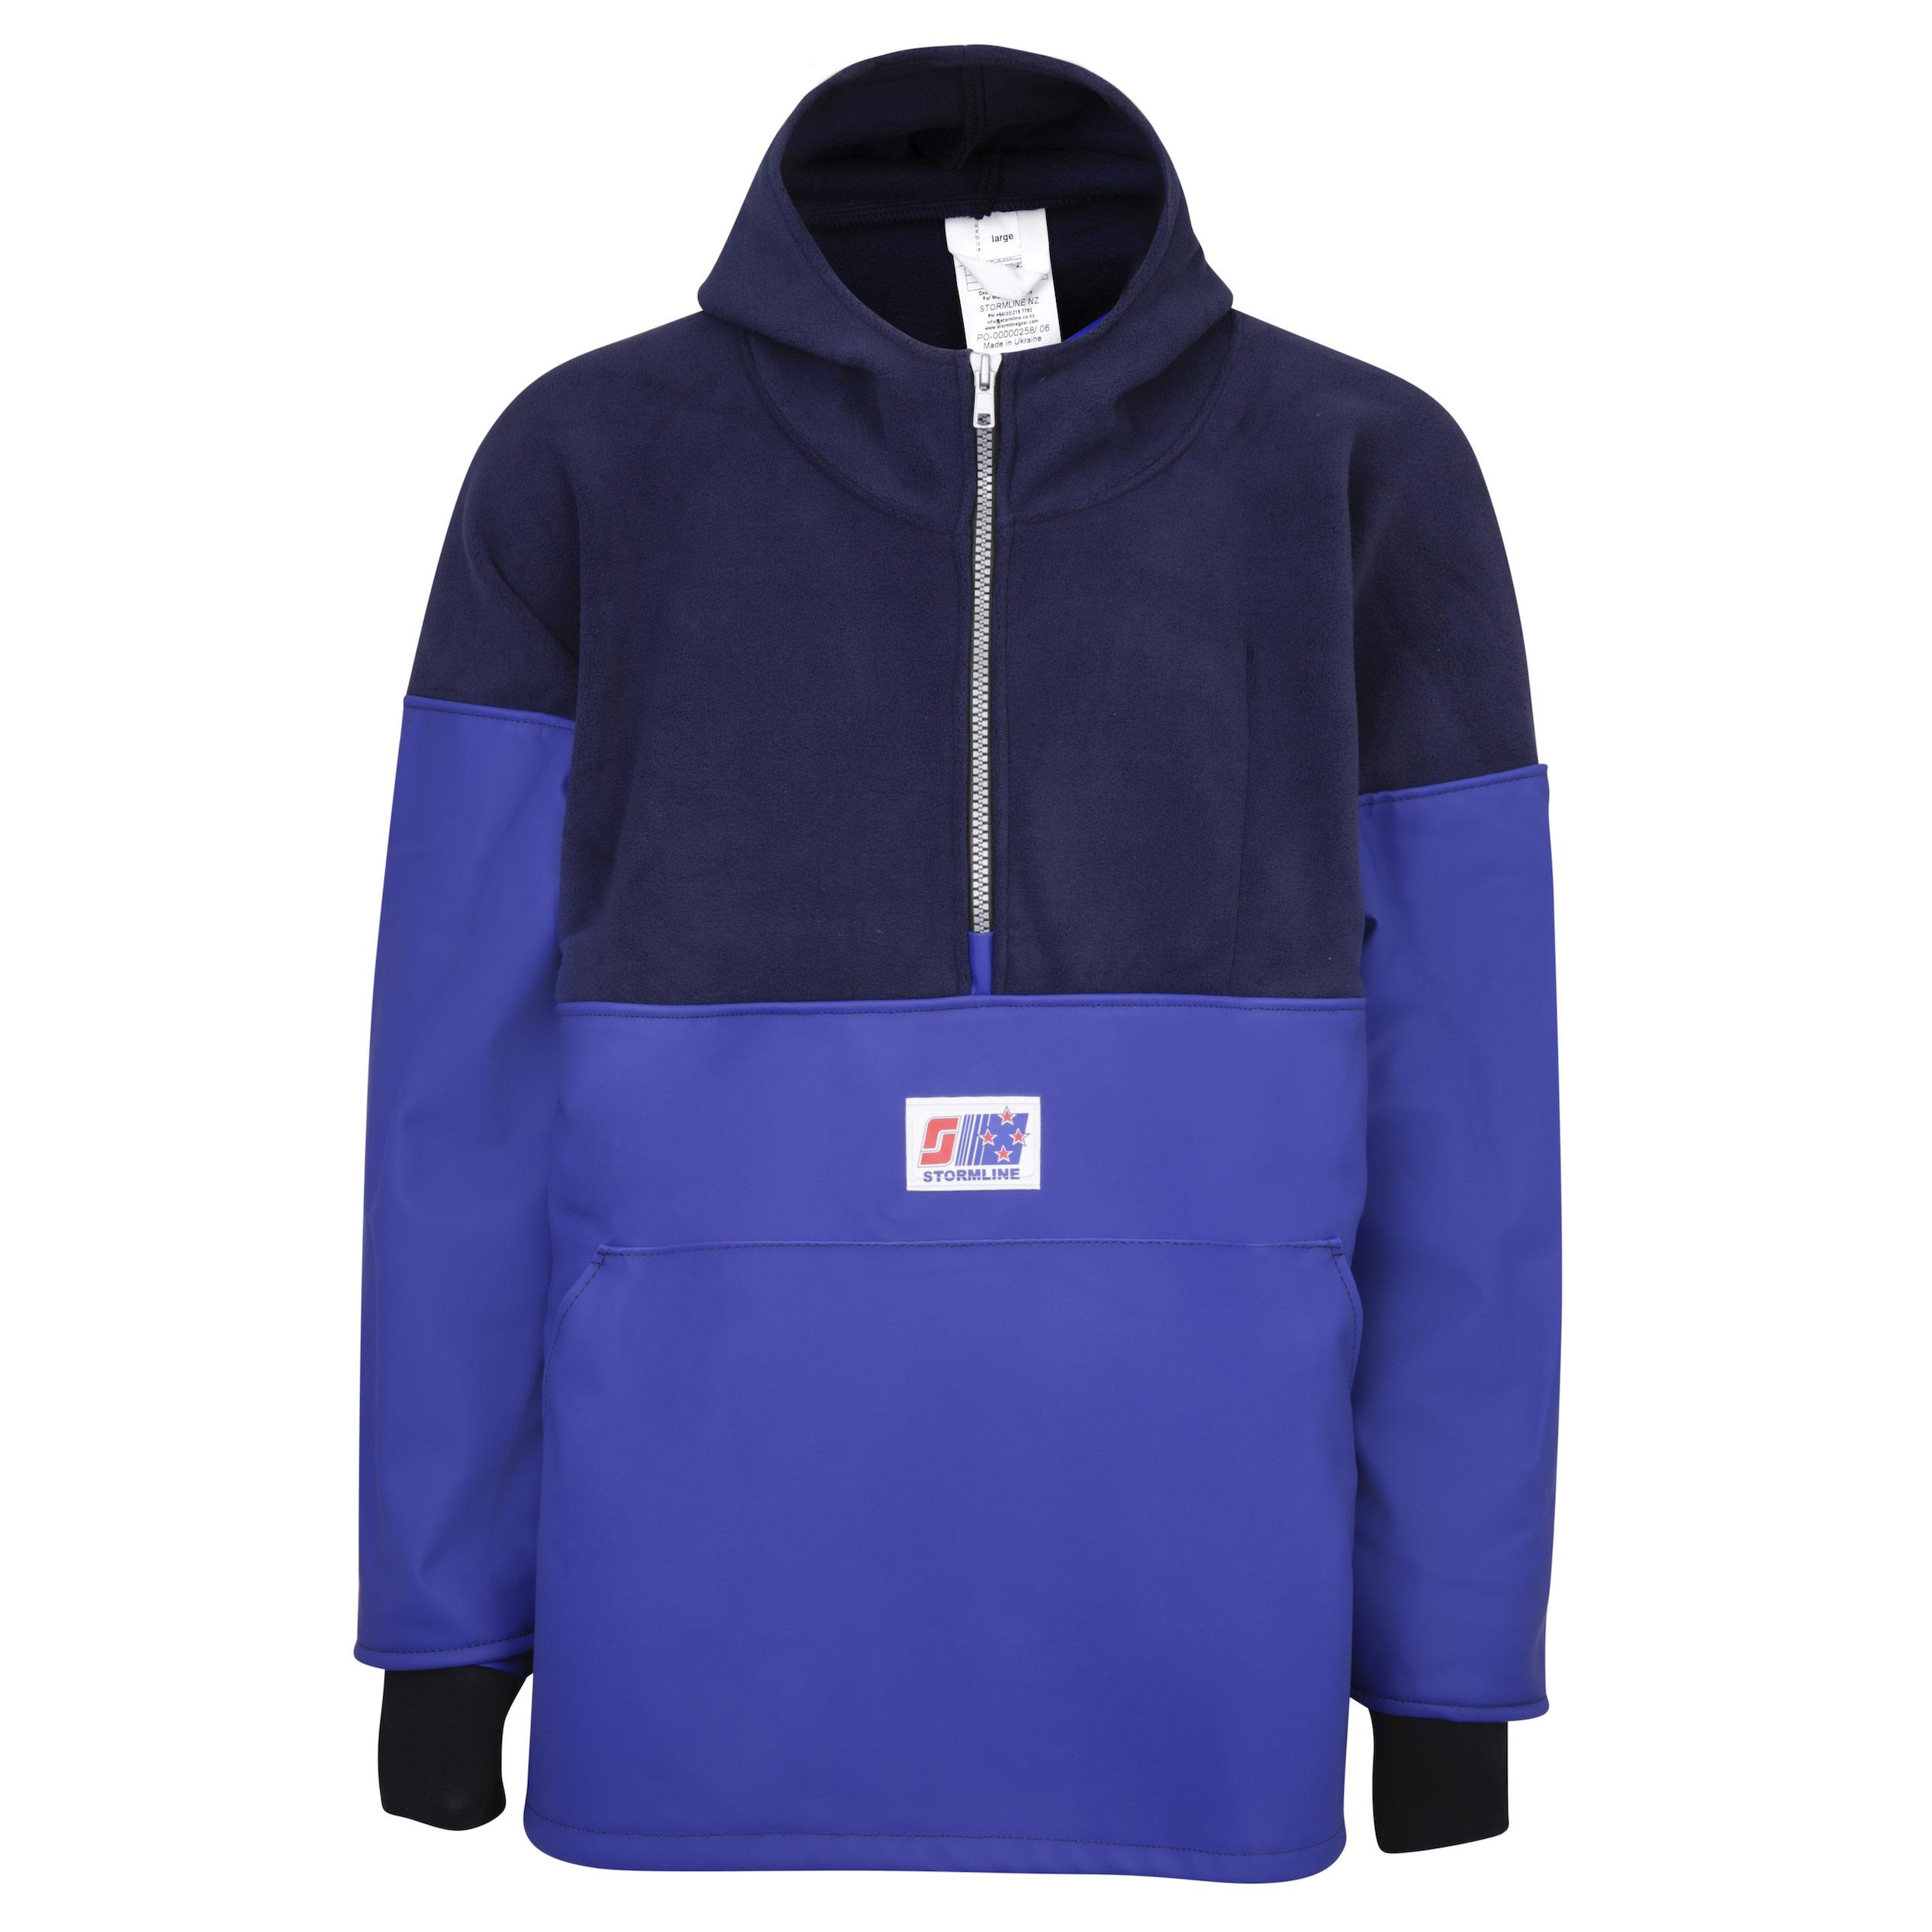 Blue Details about  /Stormline Atlantic 809 Fleece//PVC Pullover Jacket XXL XX-Large